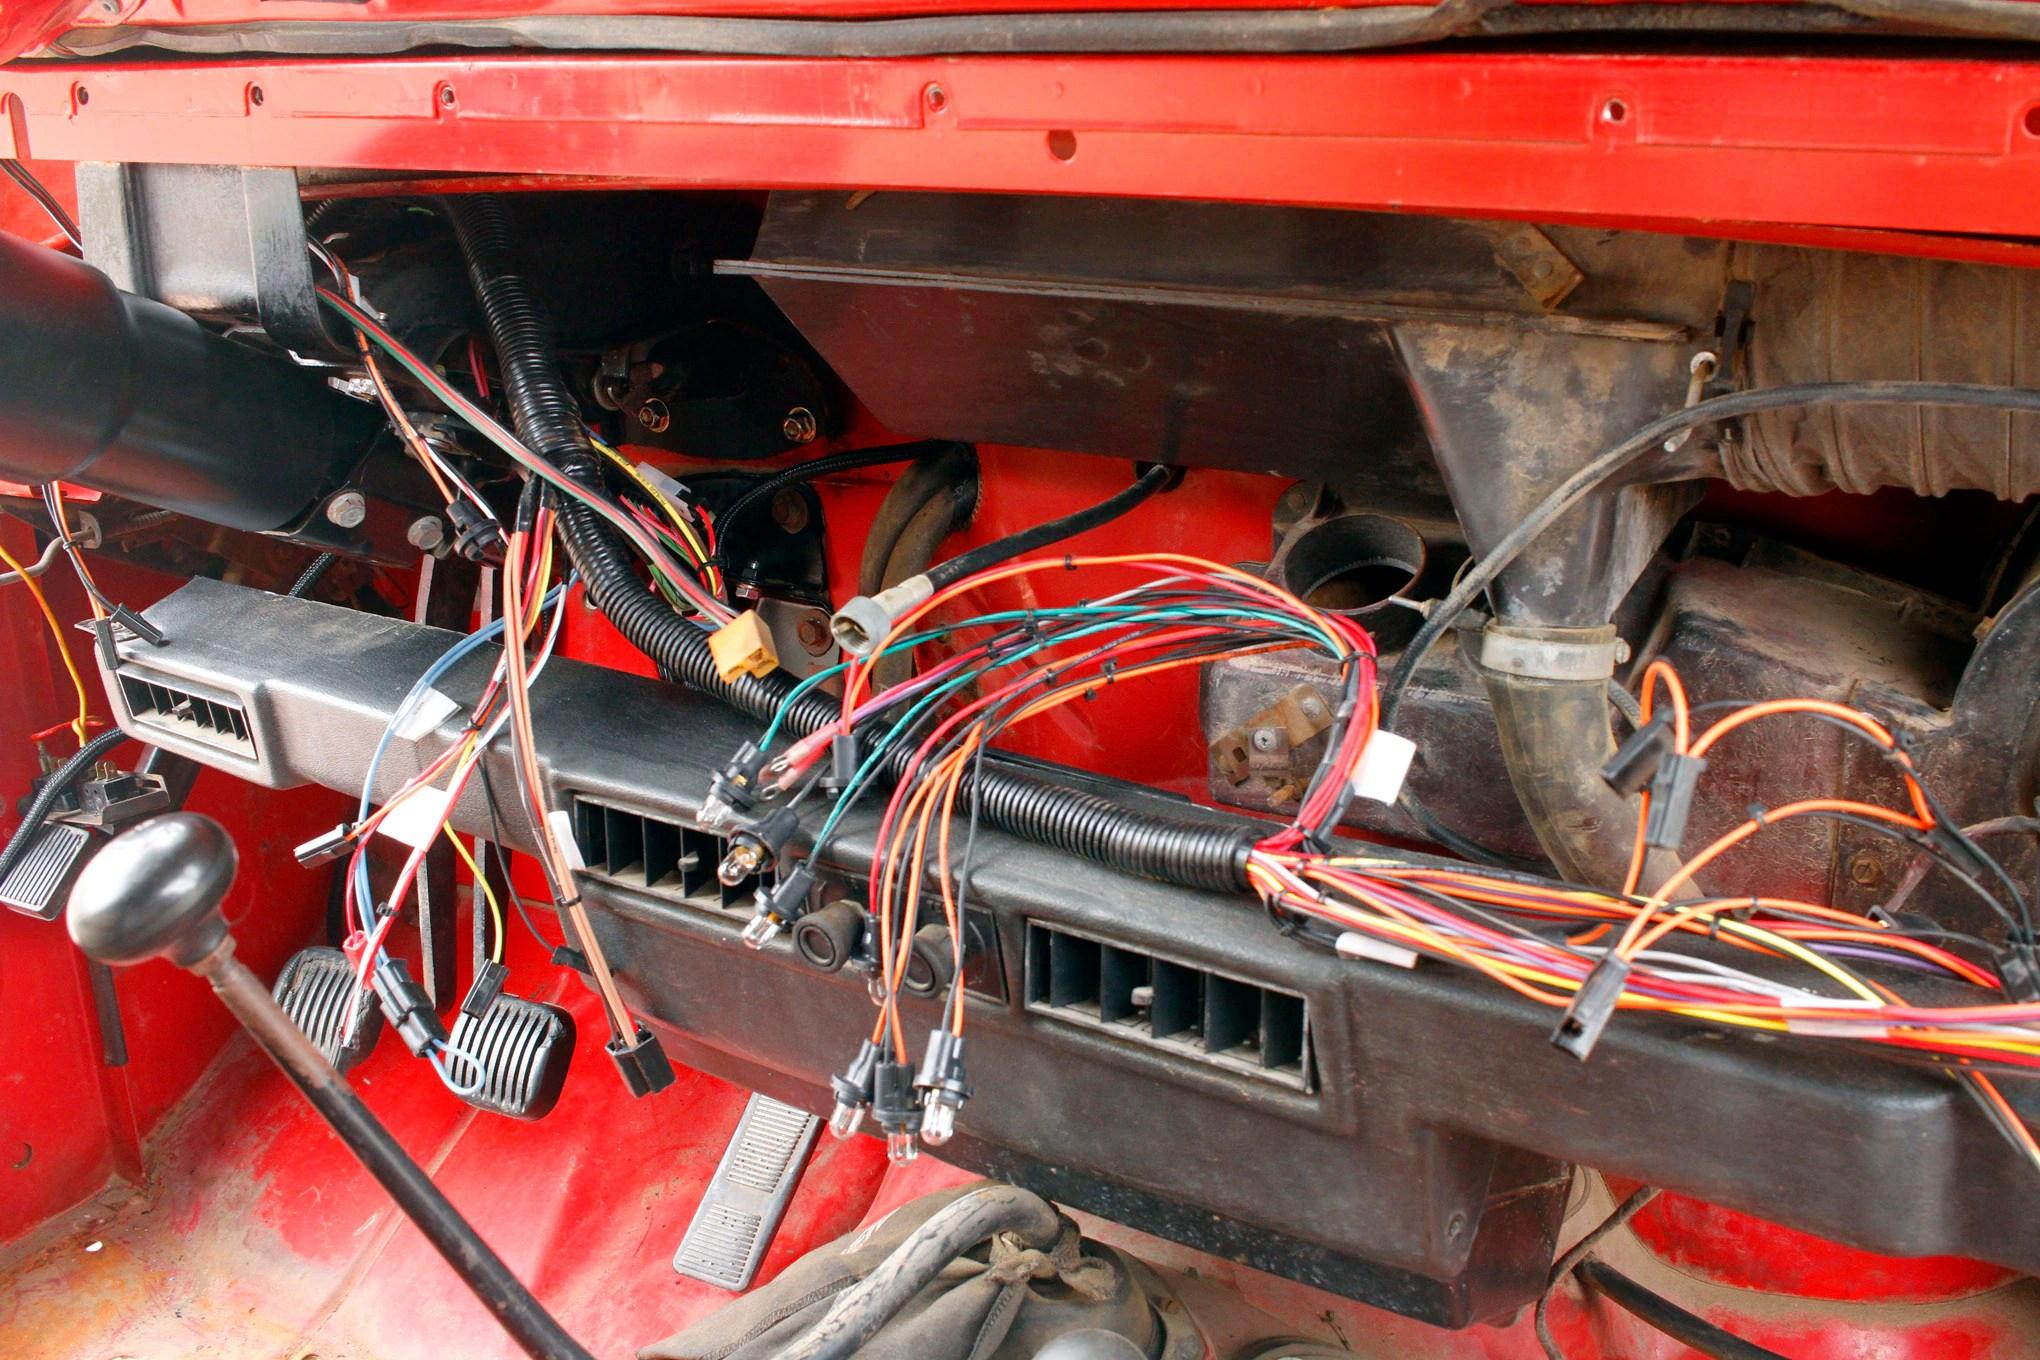 medium resolution of  cj wiring diagram on cj wiring diagram 1952 jeep cj heater diagram